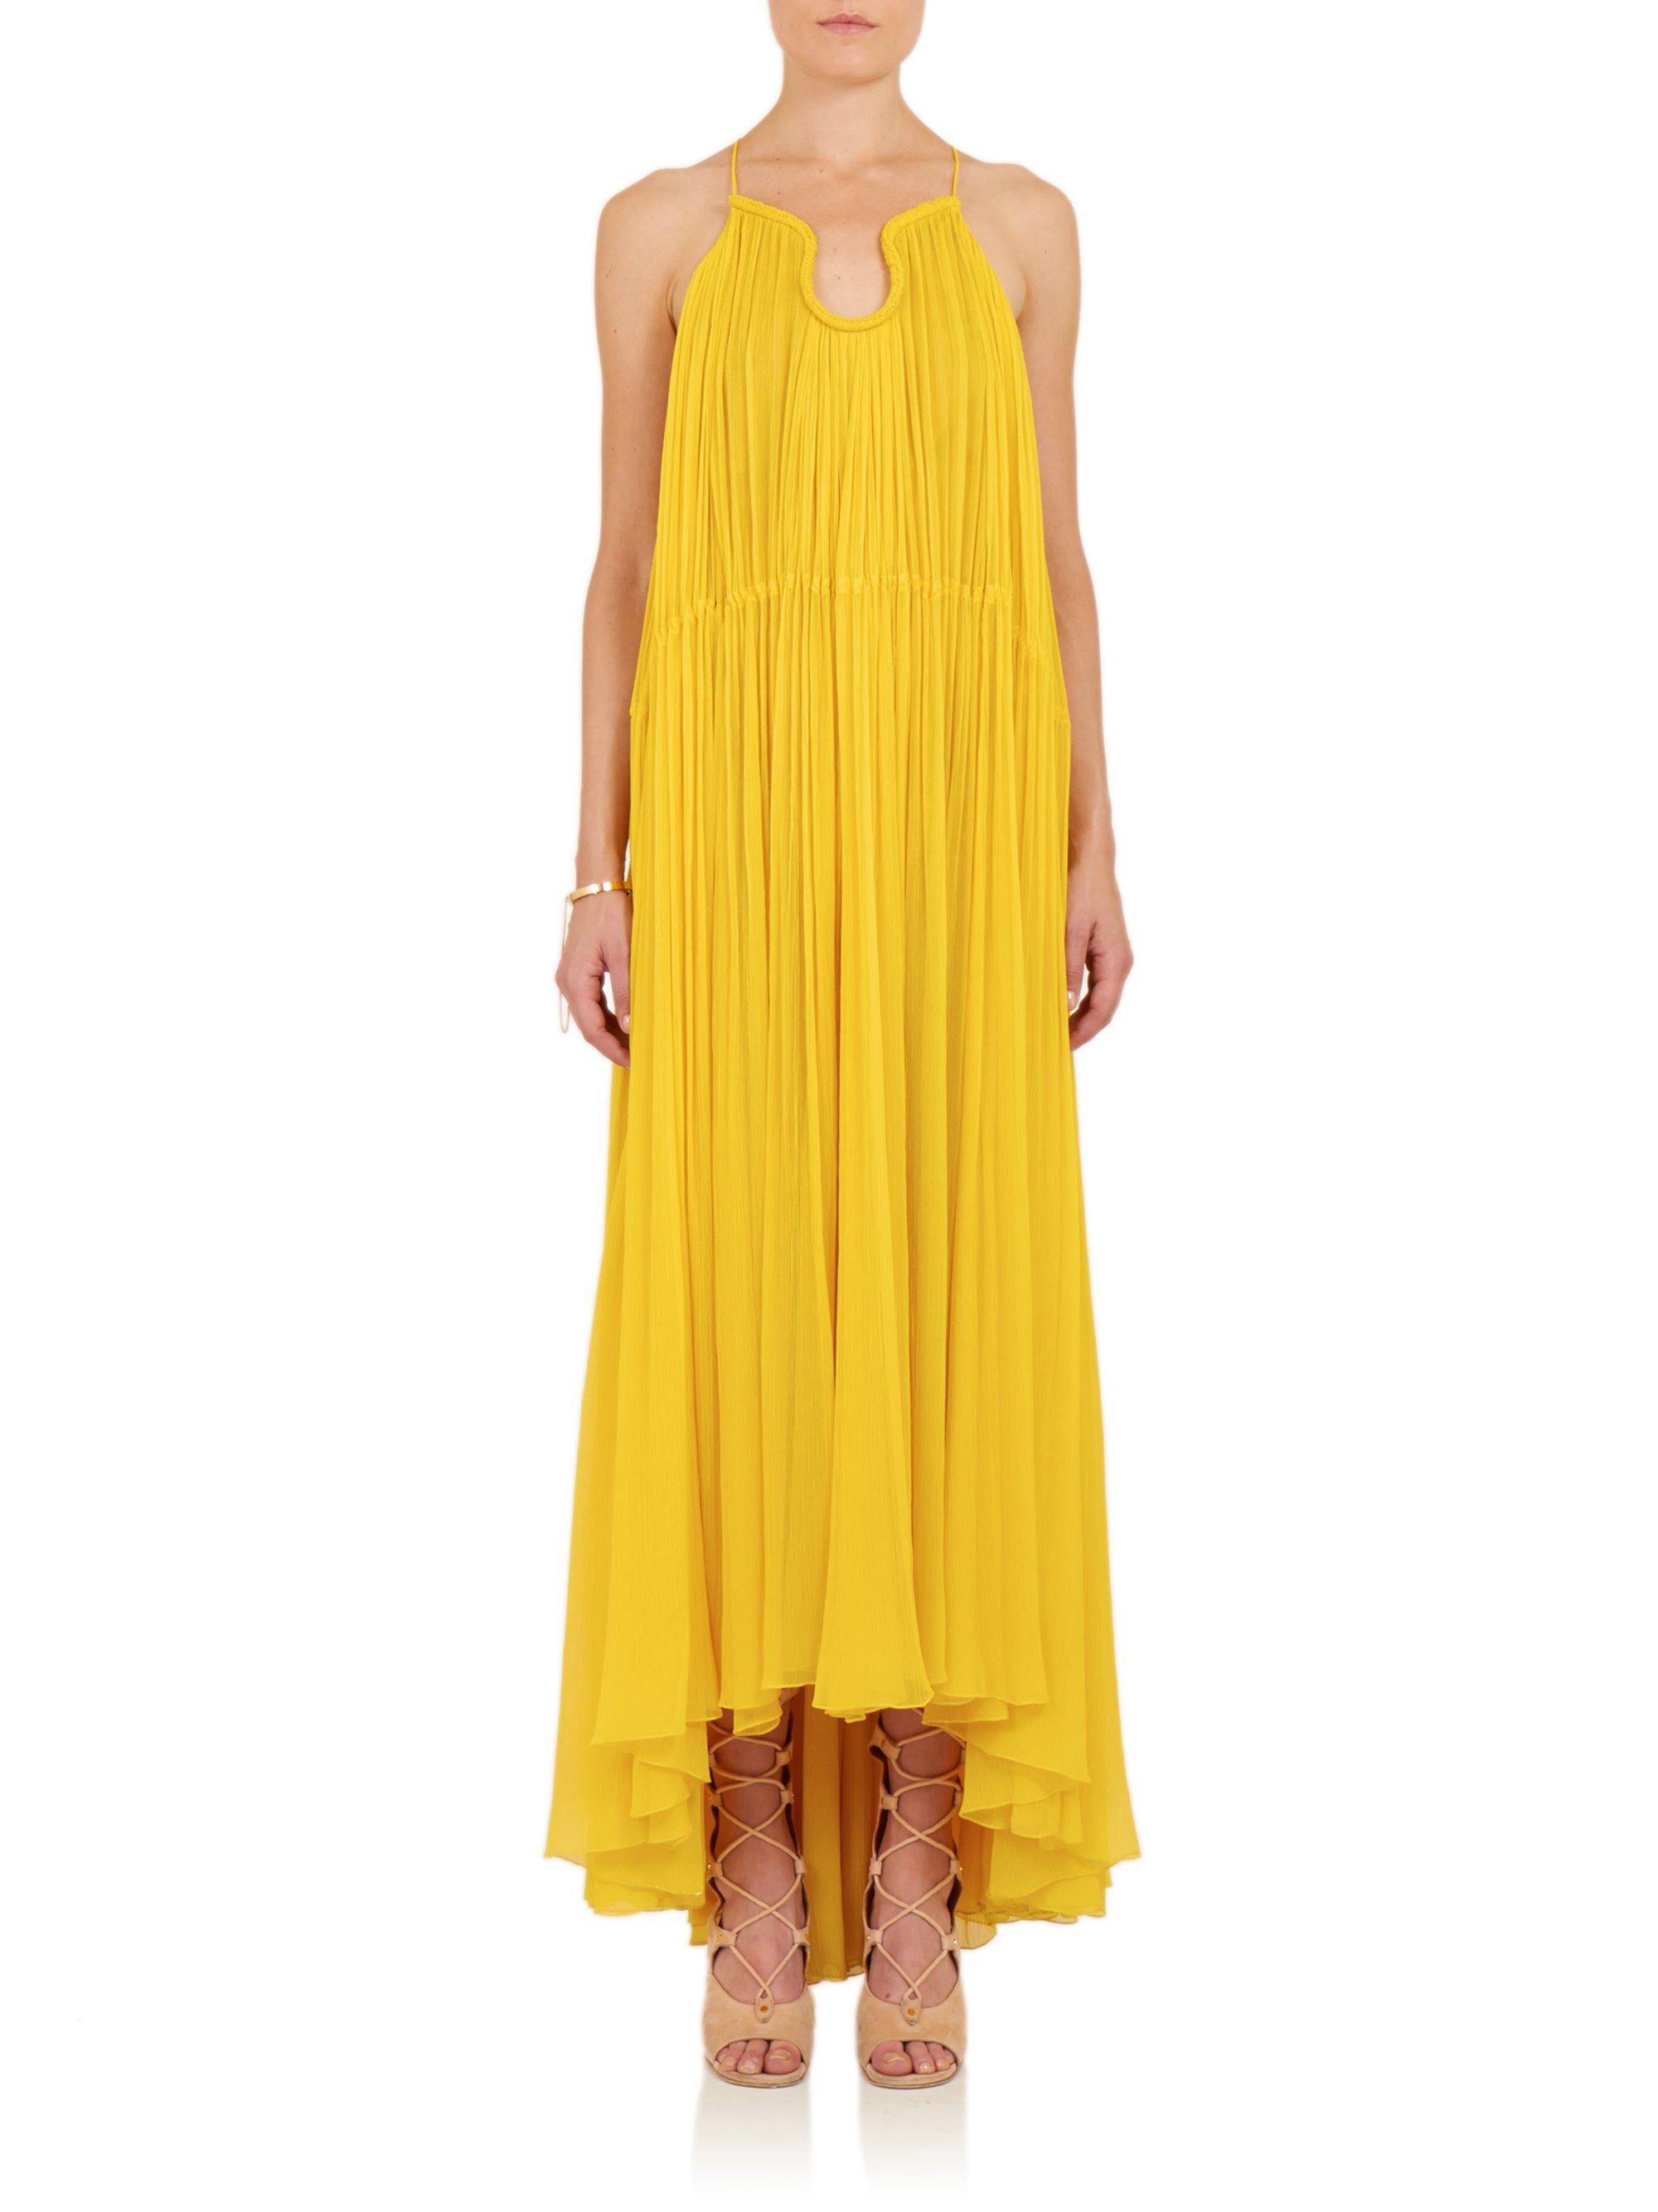 Chloé Pleated Silk Maxi Dress in Yellow   Lyst